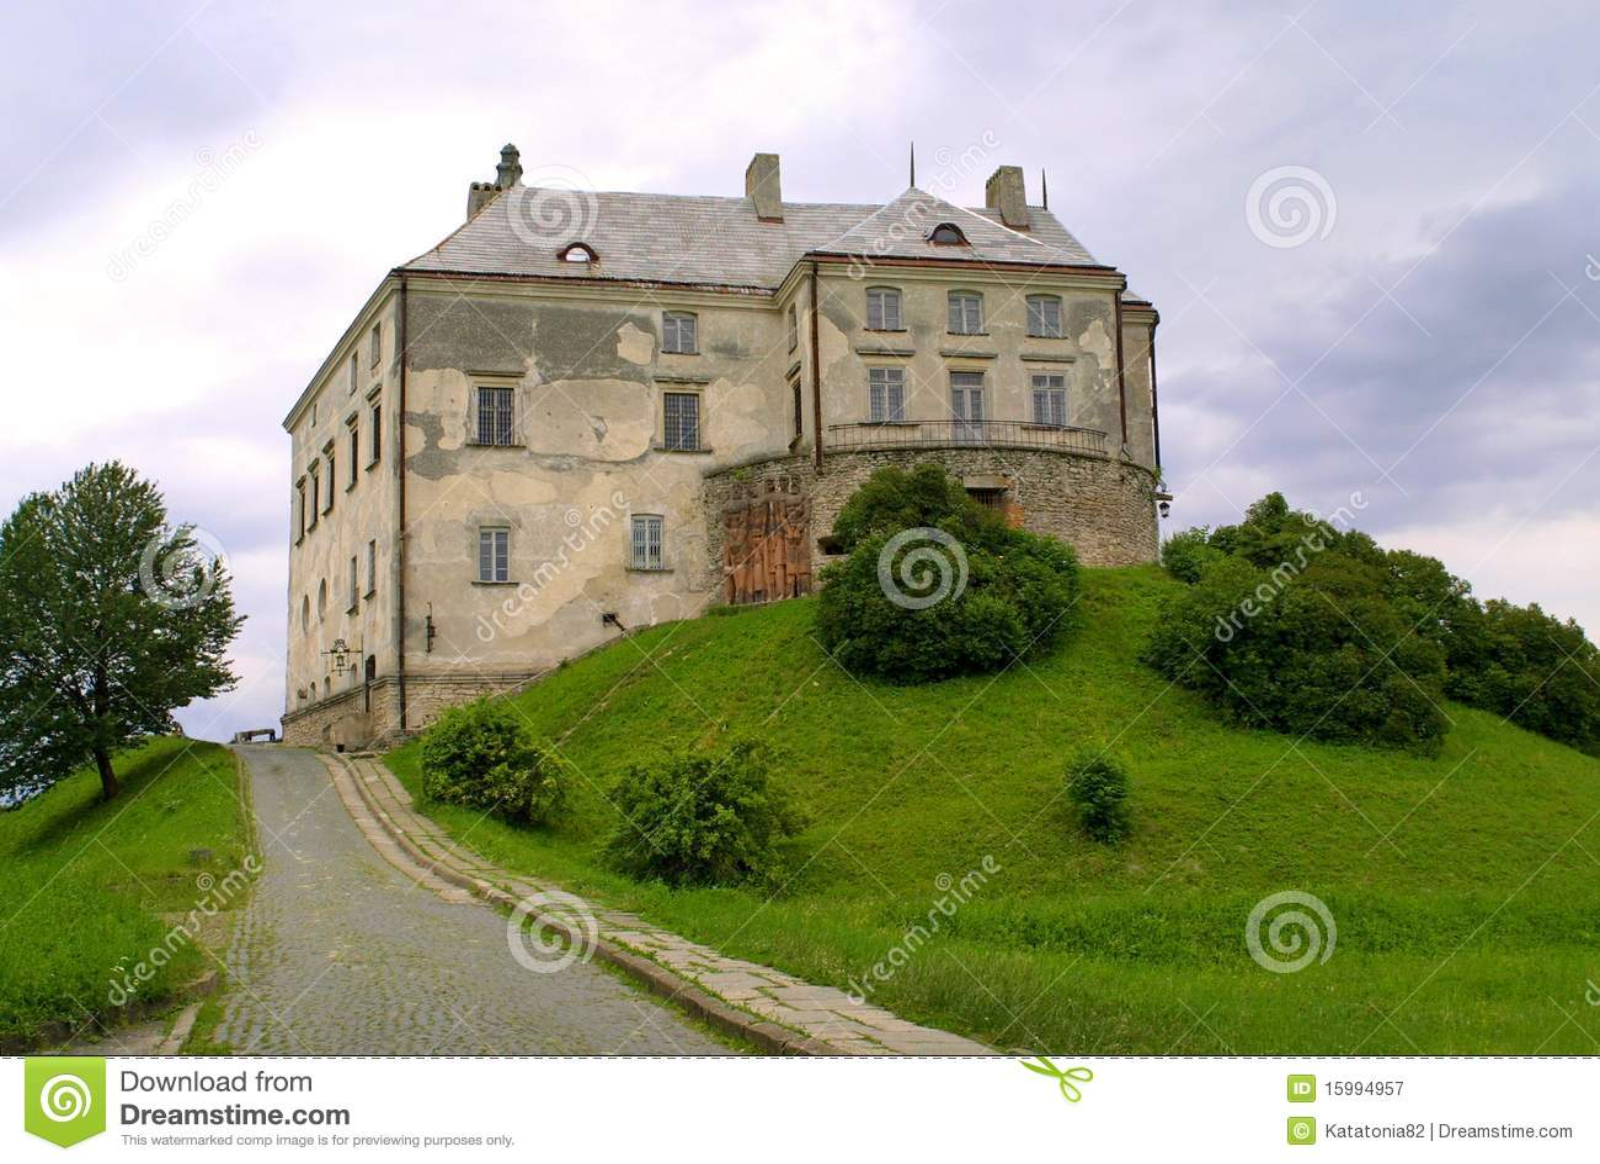 Old castle in Olesko, Ukraine